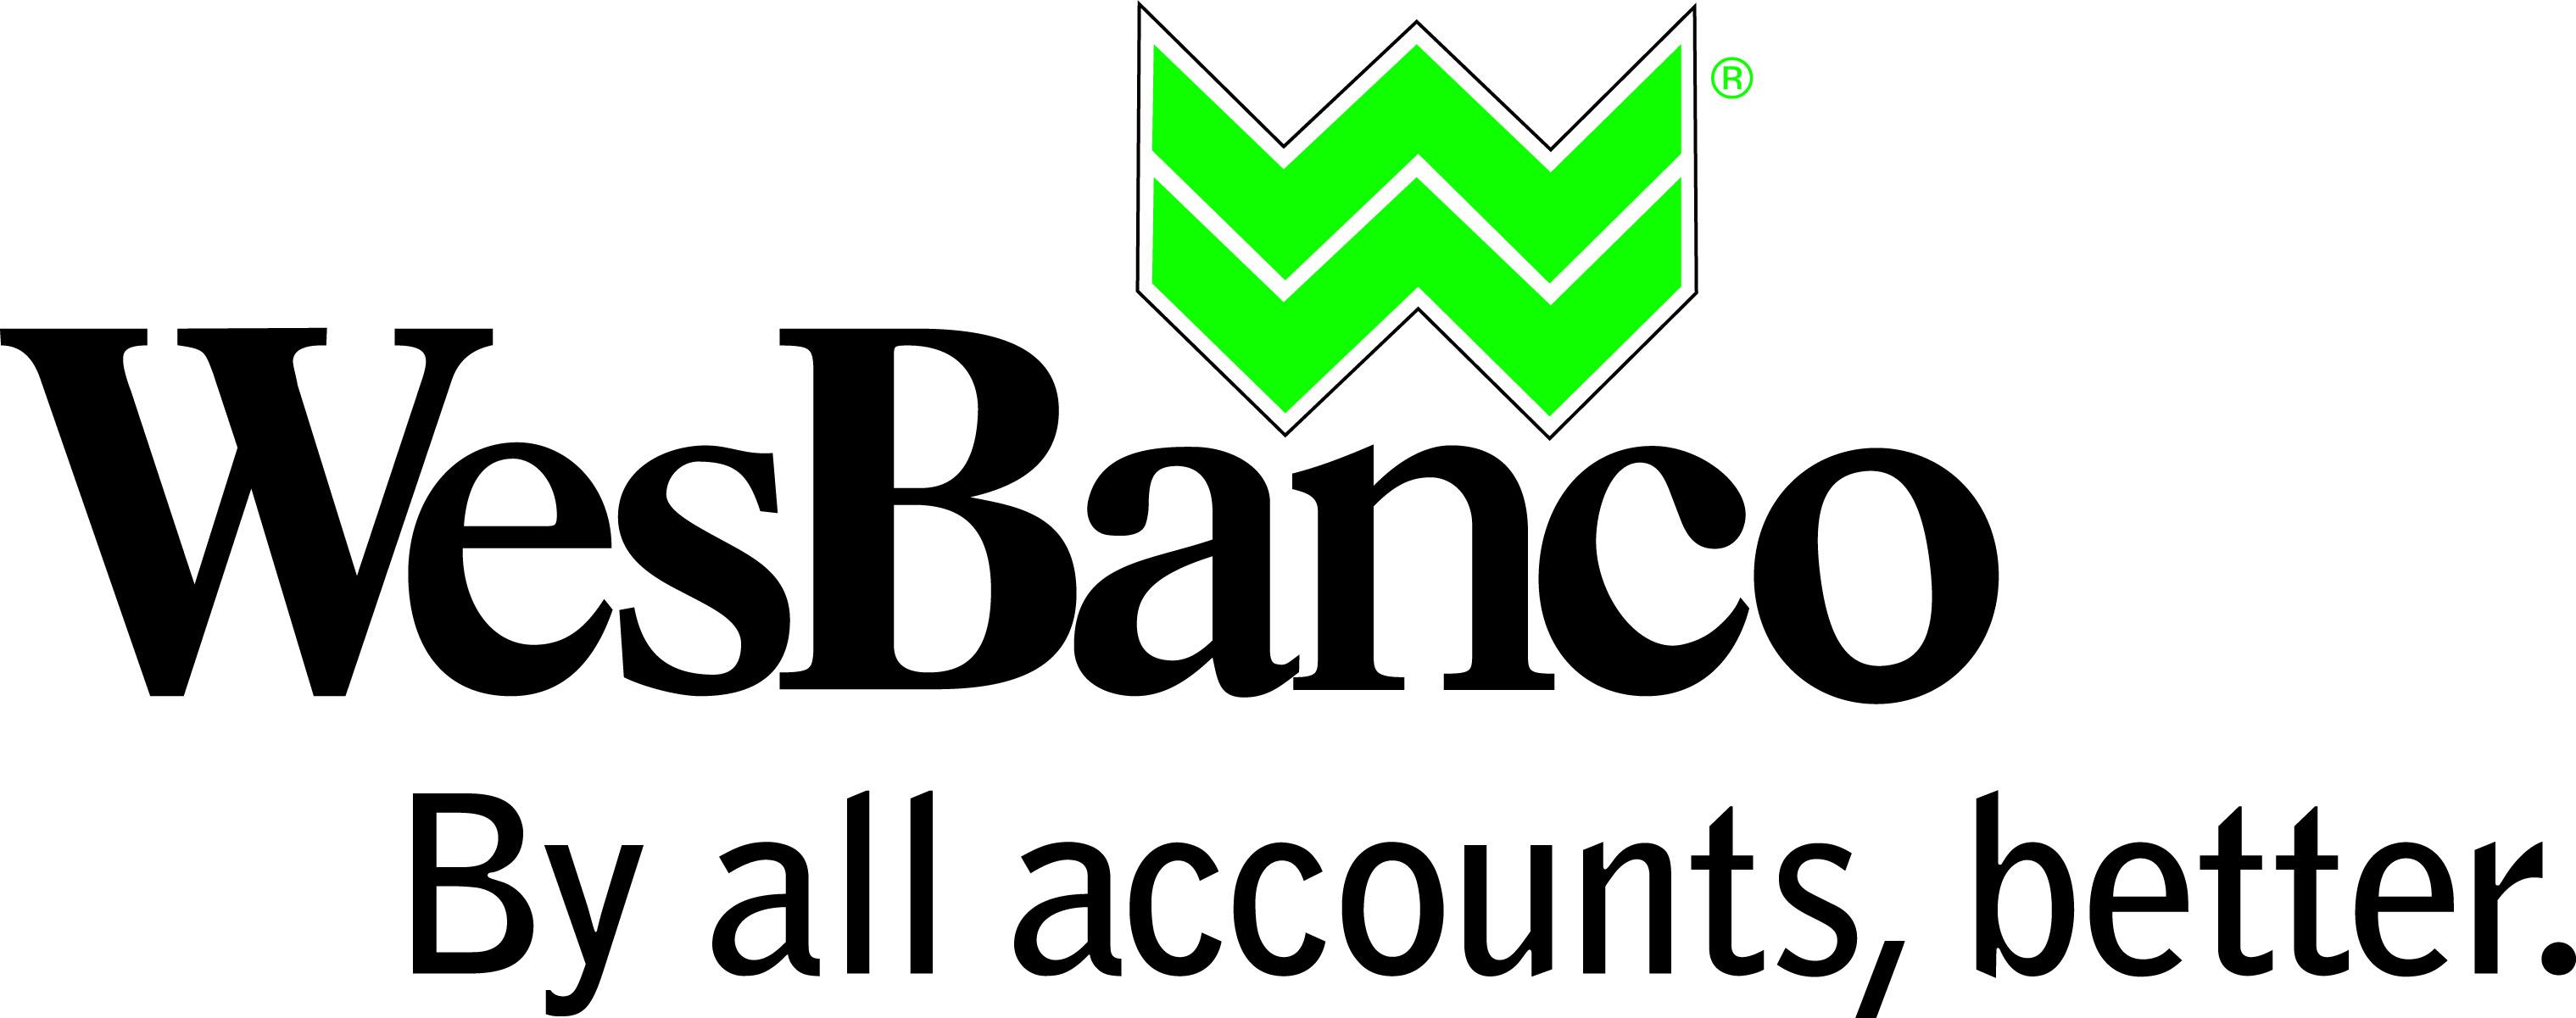 WesBanco 10 logo